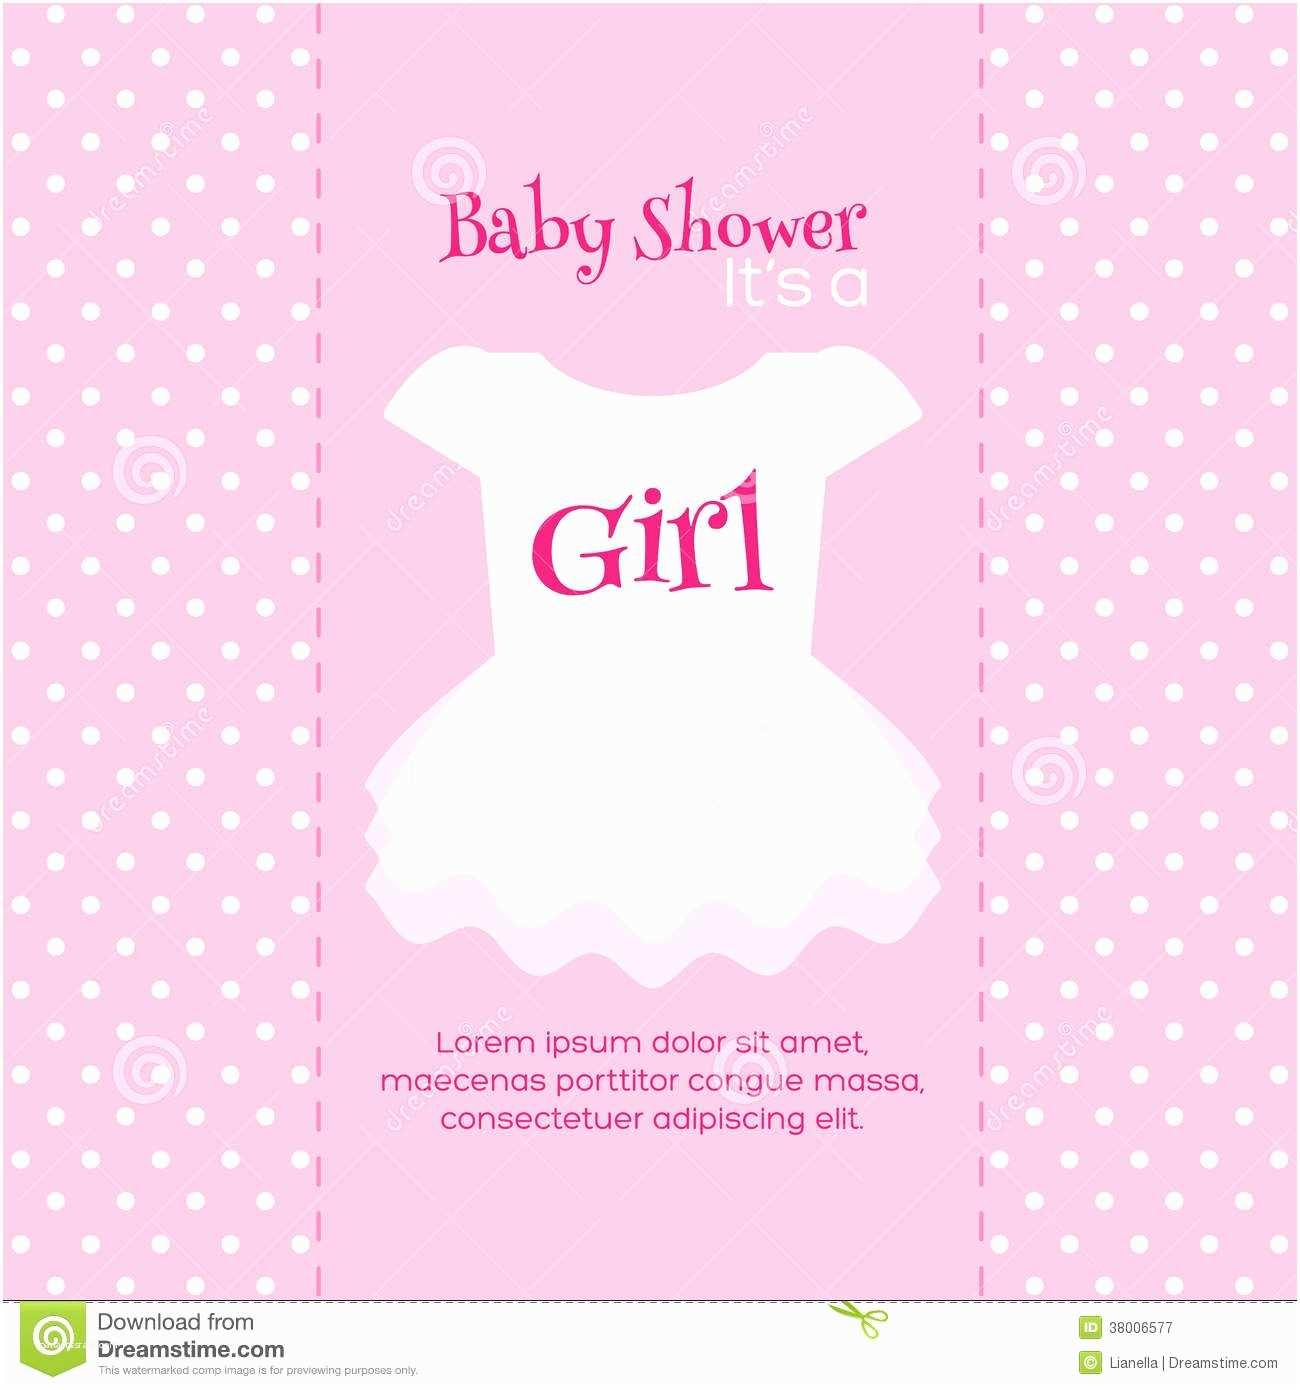 Free Baby Shower Invitations  Girl Baby Shower Invitations